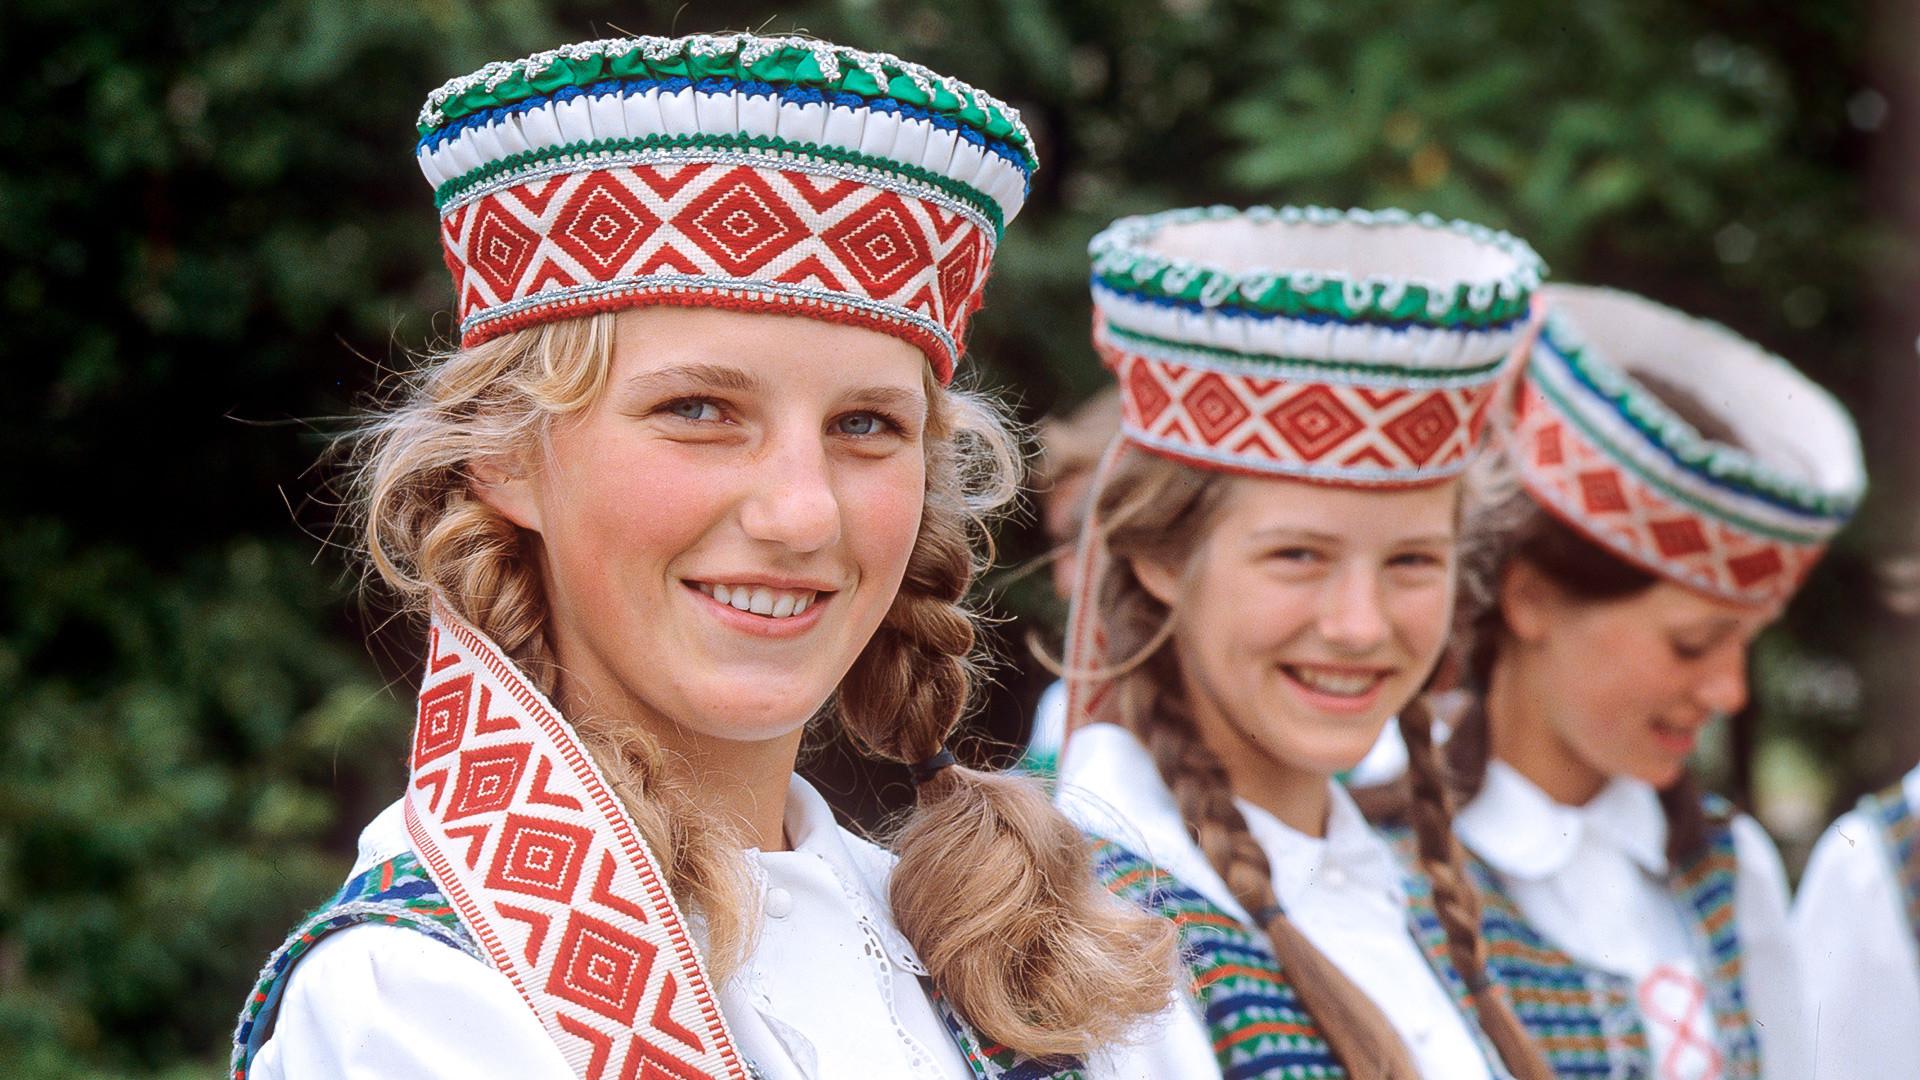 Niñas con trajes tradicionales, Lituania soviética